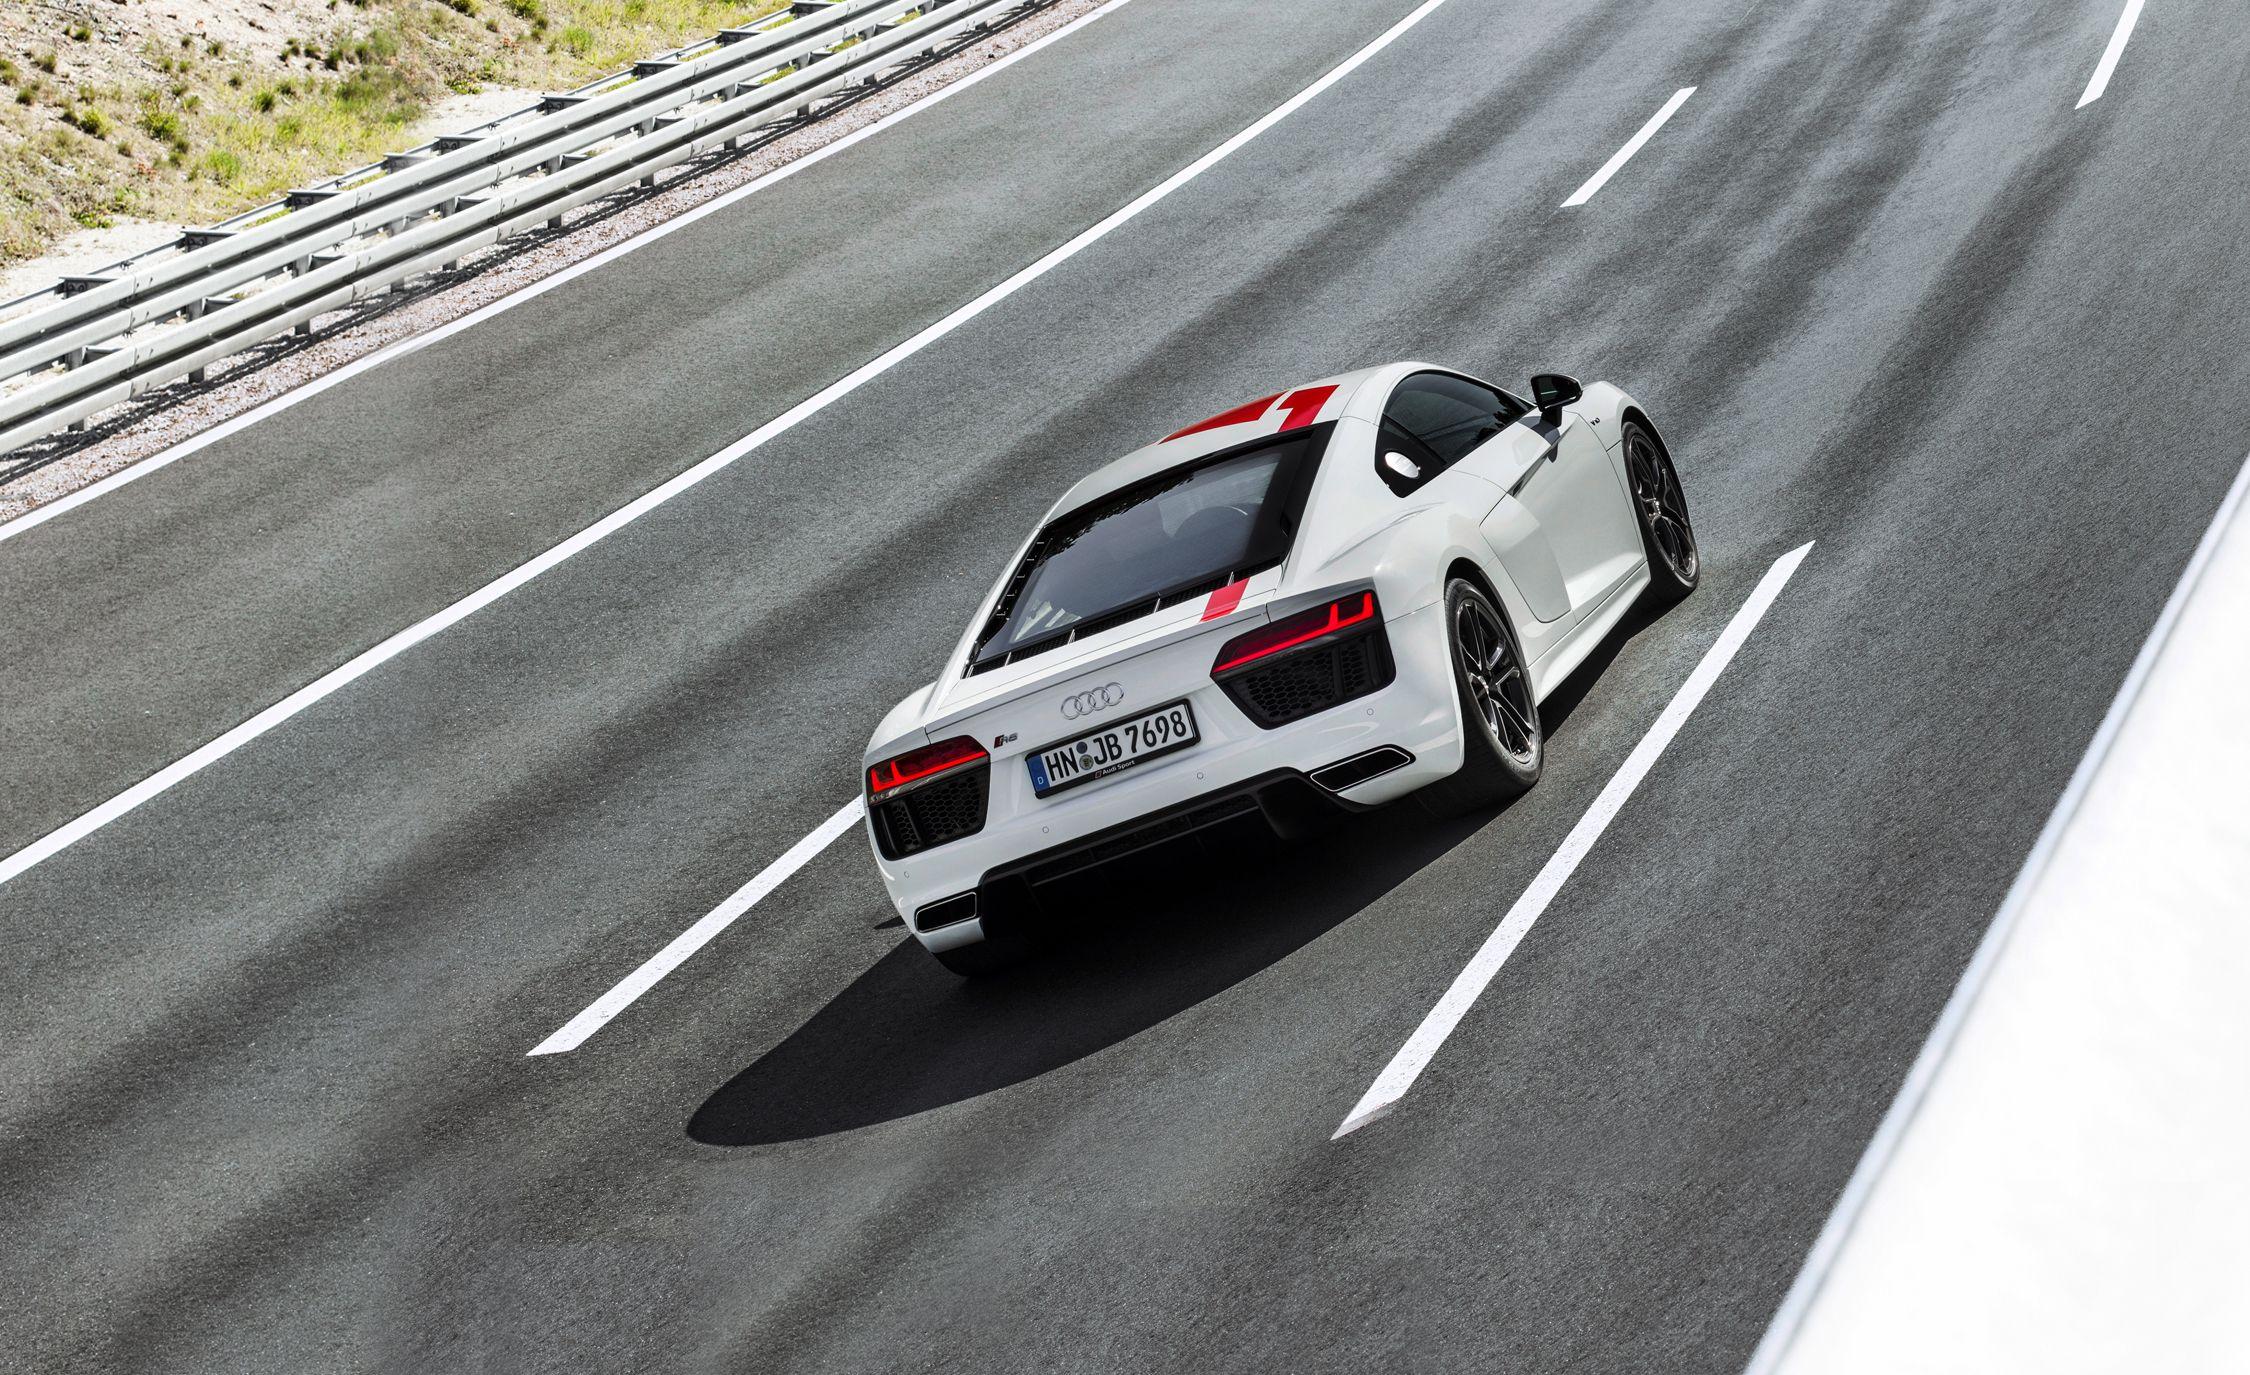 2018 Audi R8 V10 Rws Official Photos And Info News Car And Driver